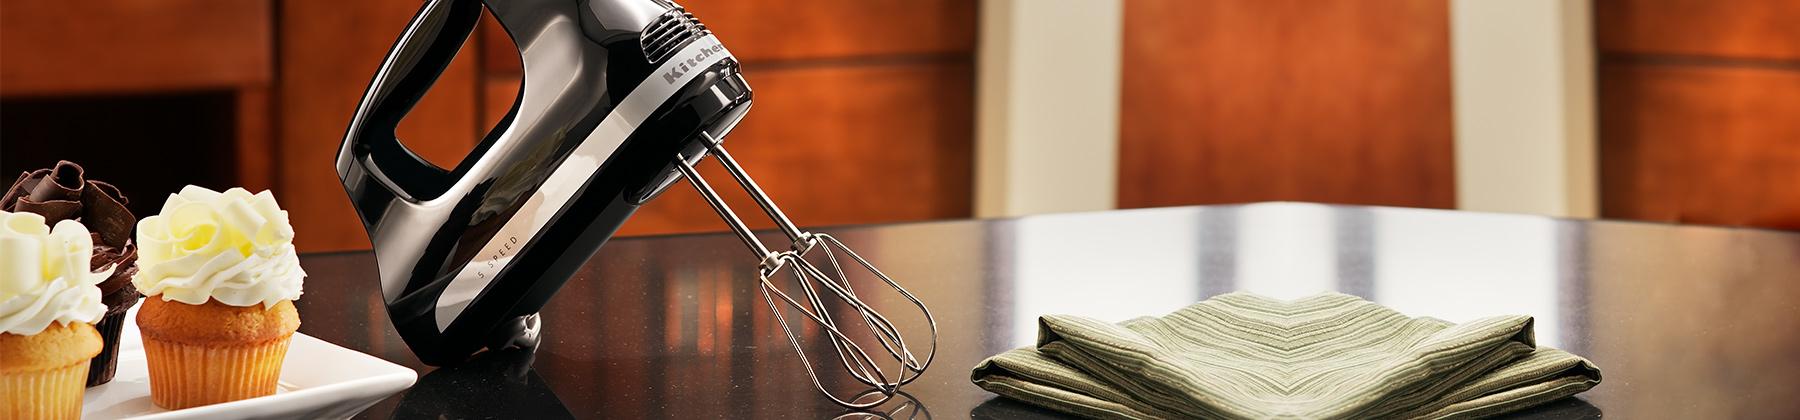 Photo of hand mixers.